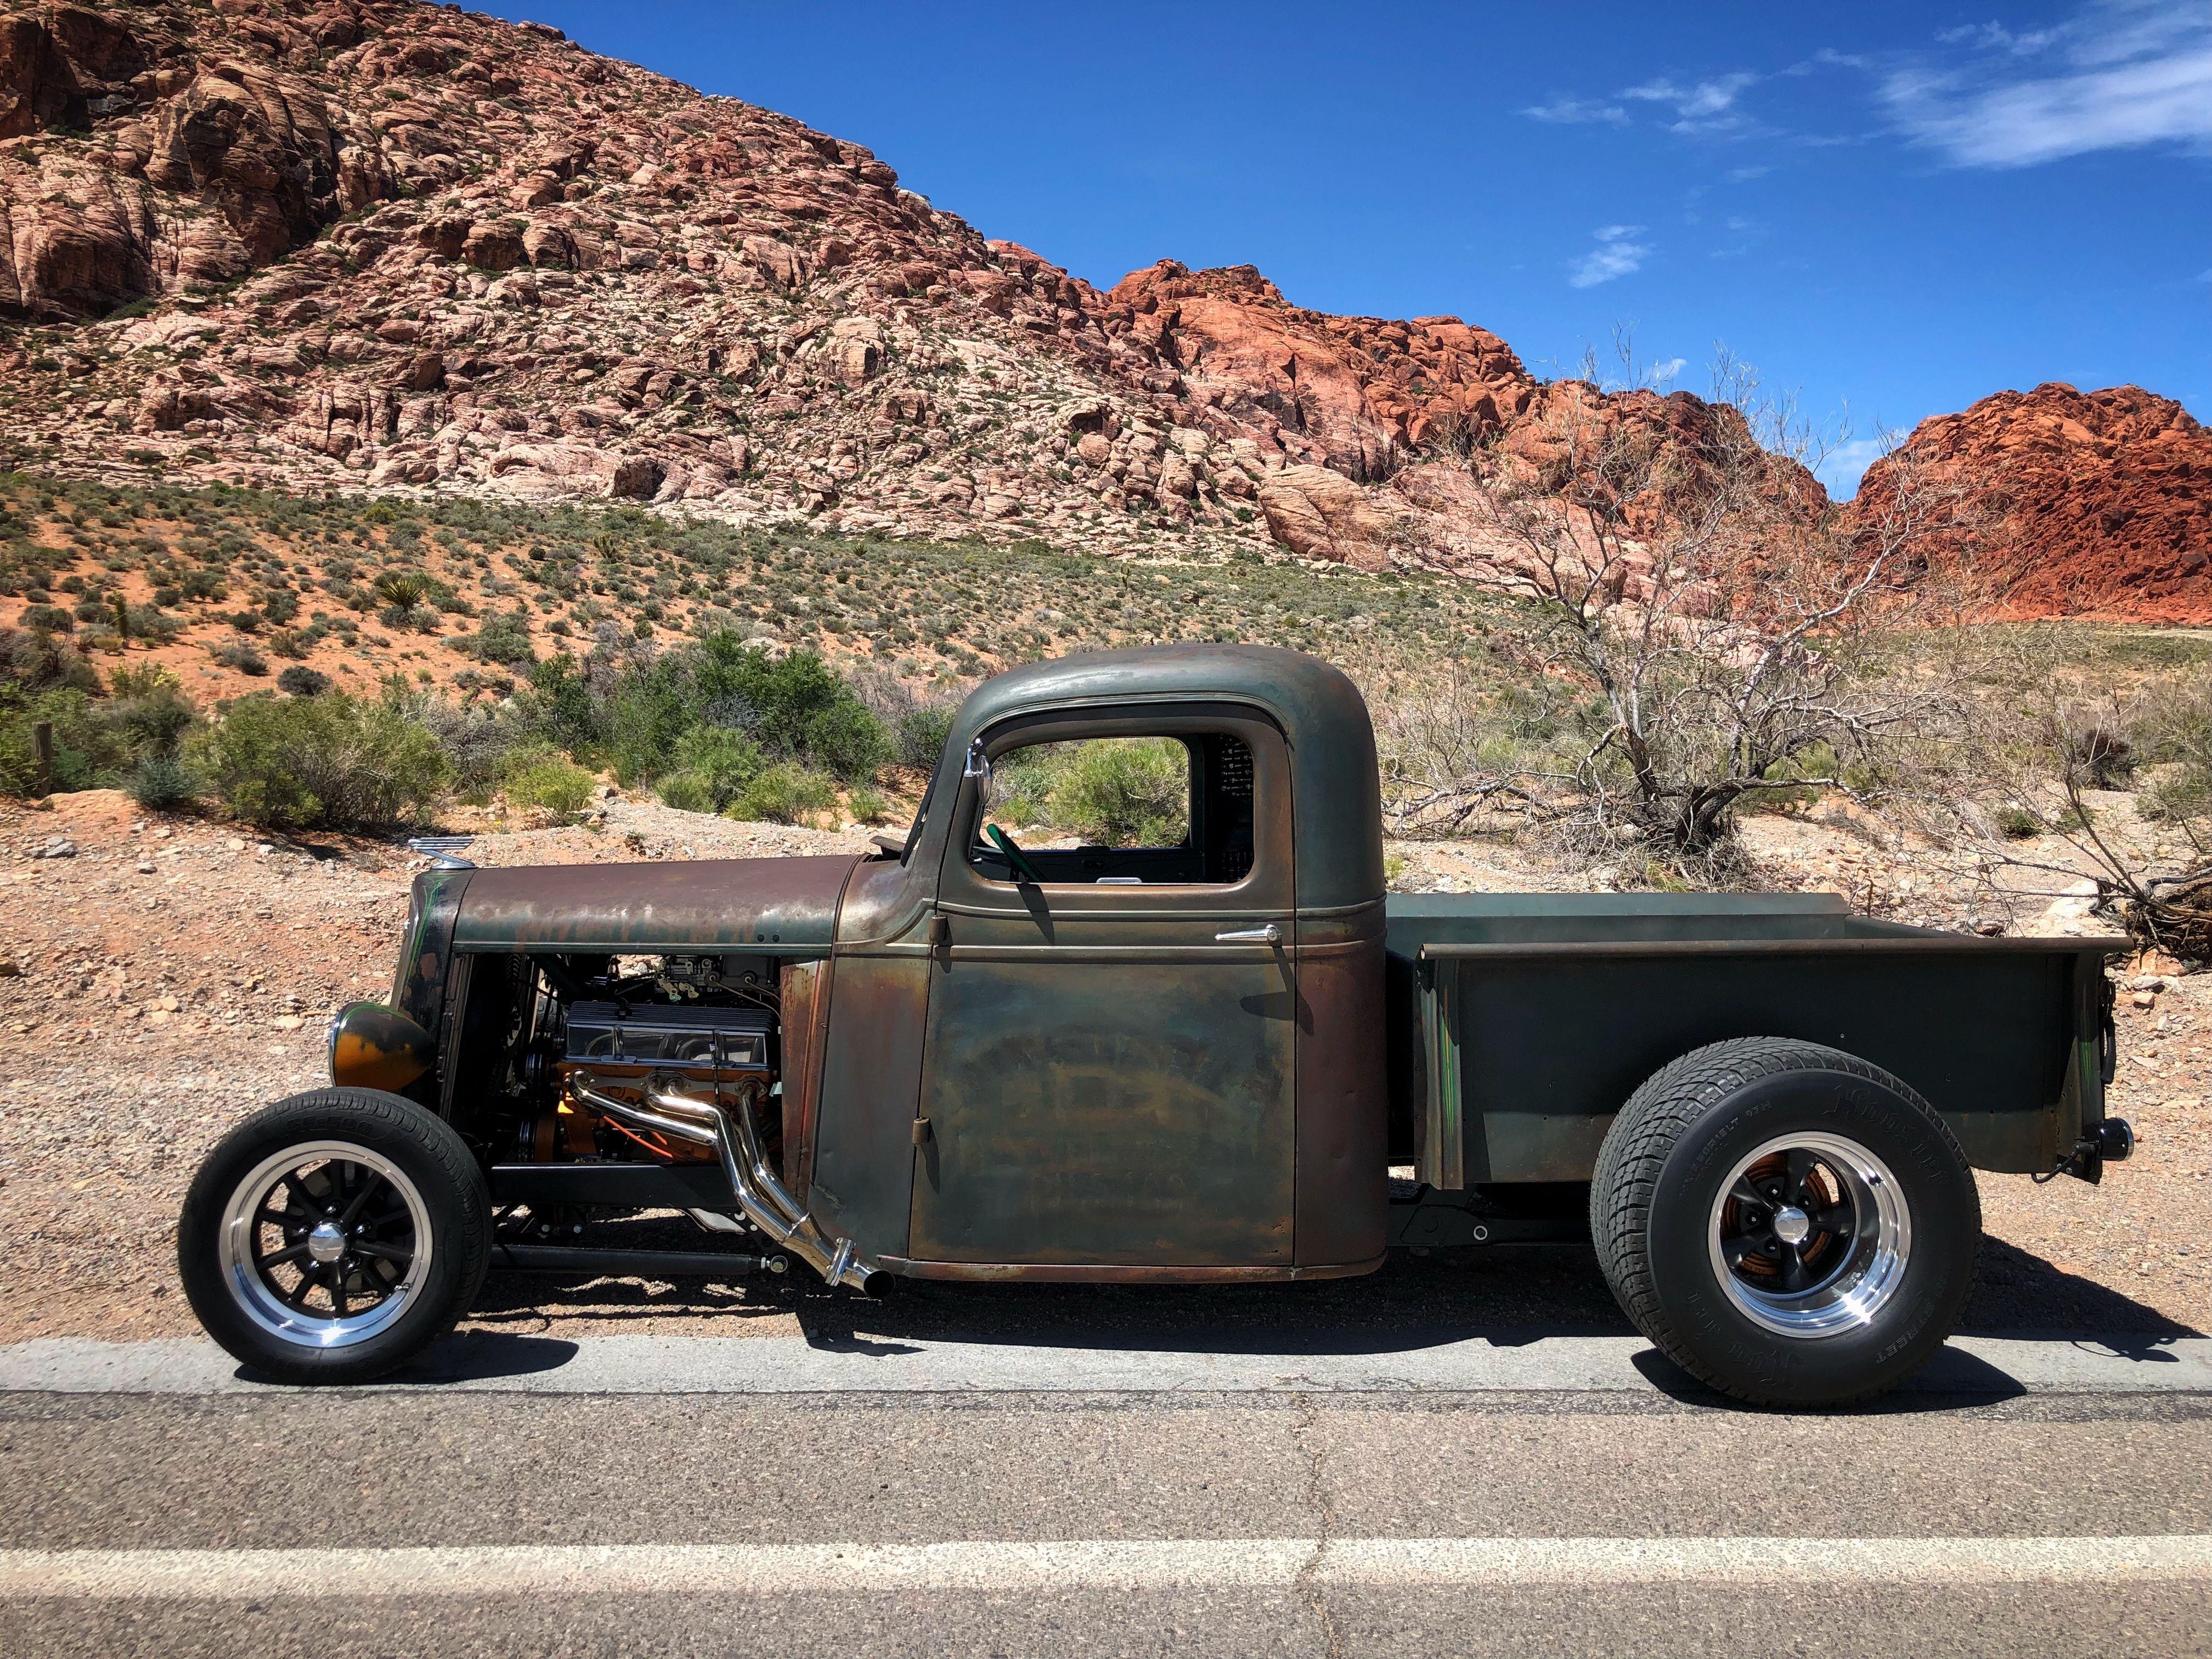 1937 Chevy Rat Rod Truck Rat Rod Rat Rods Truck Cool Cars